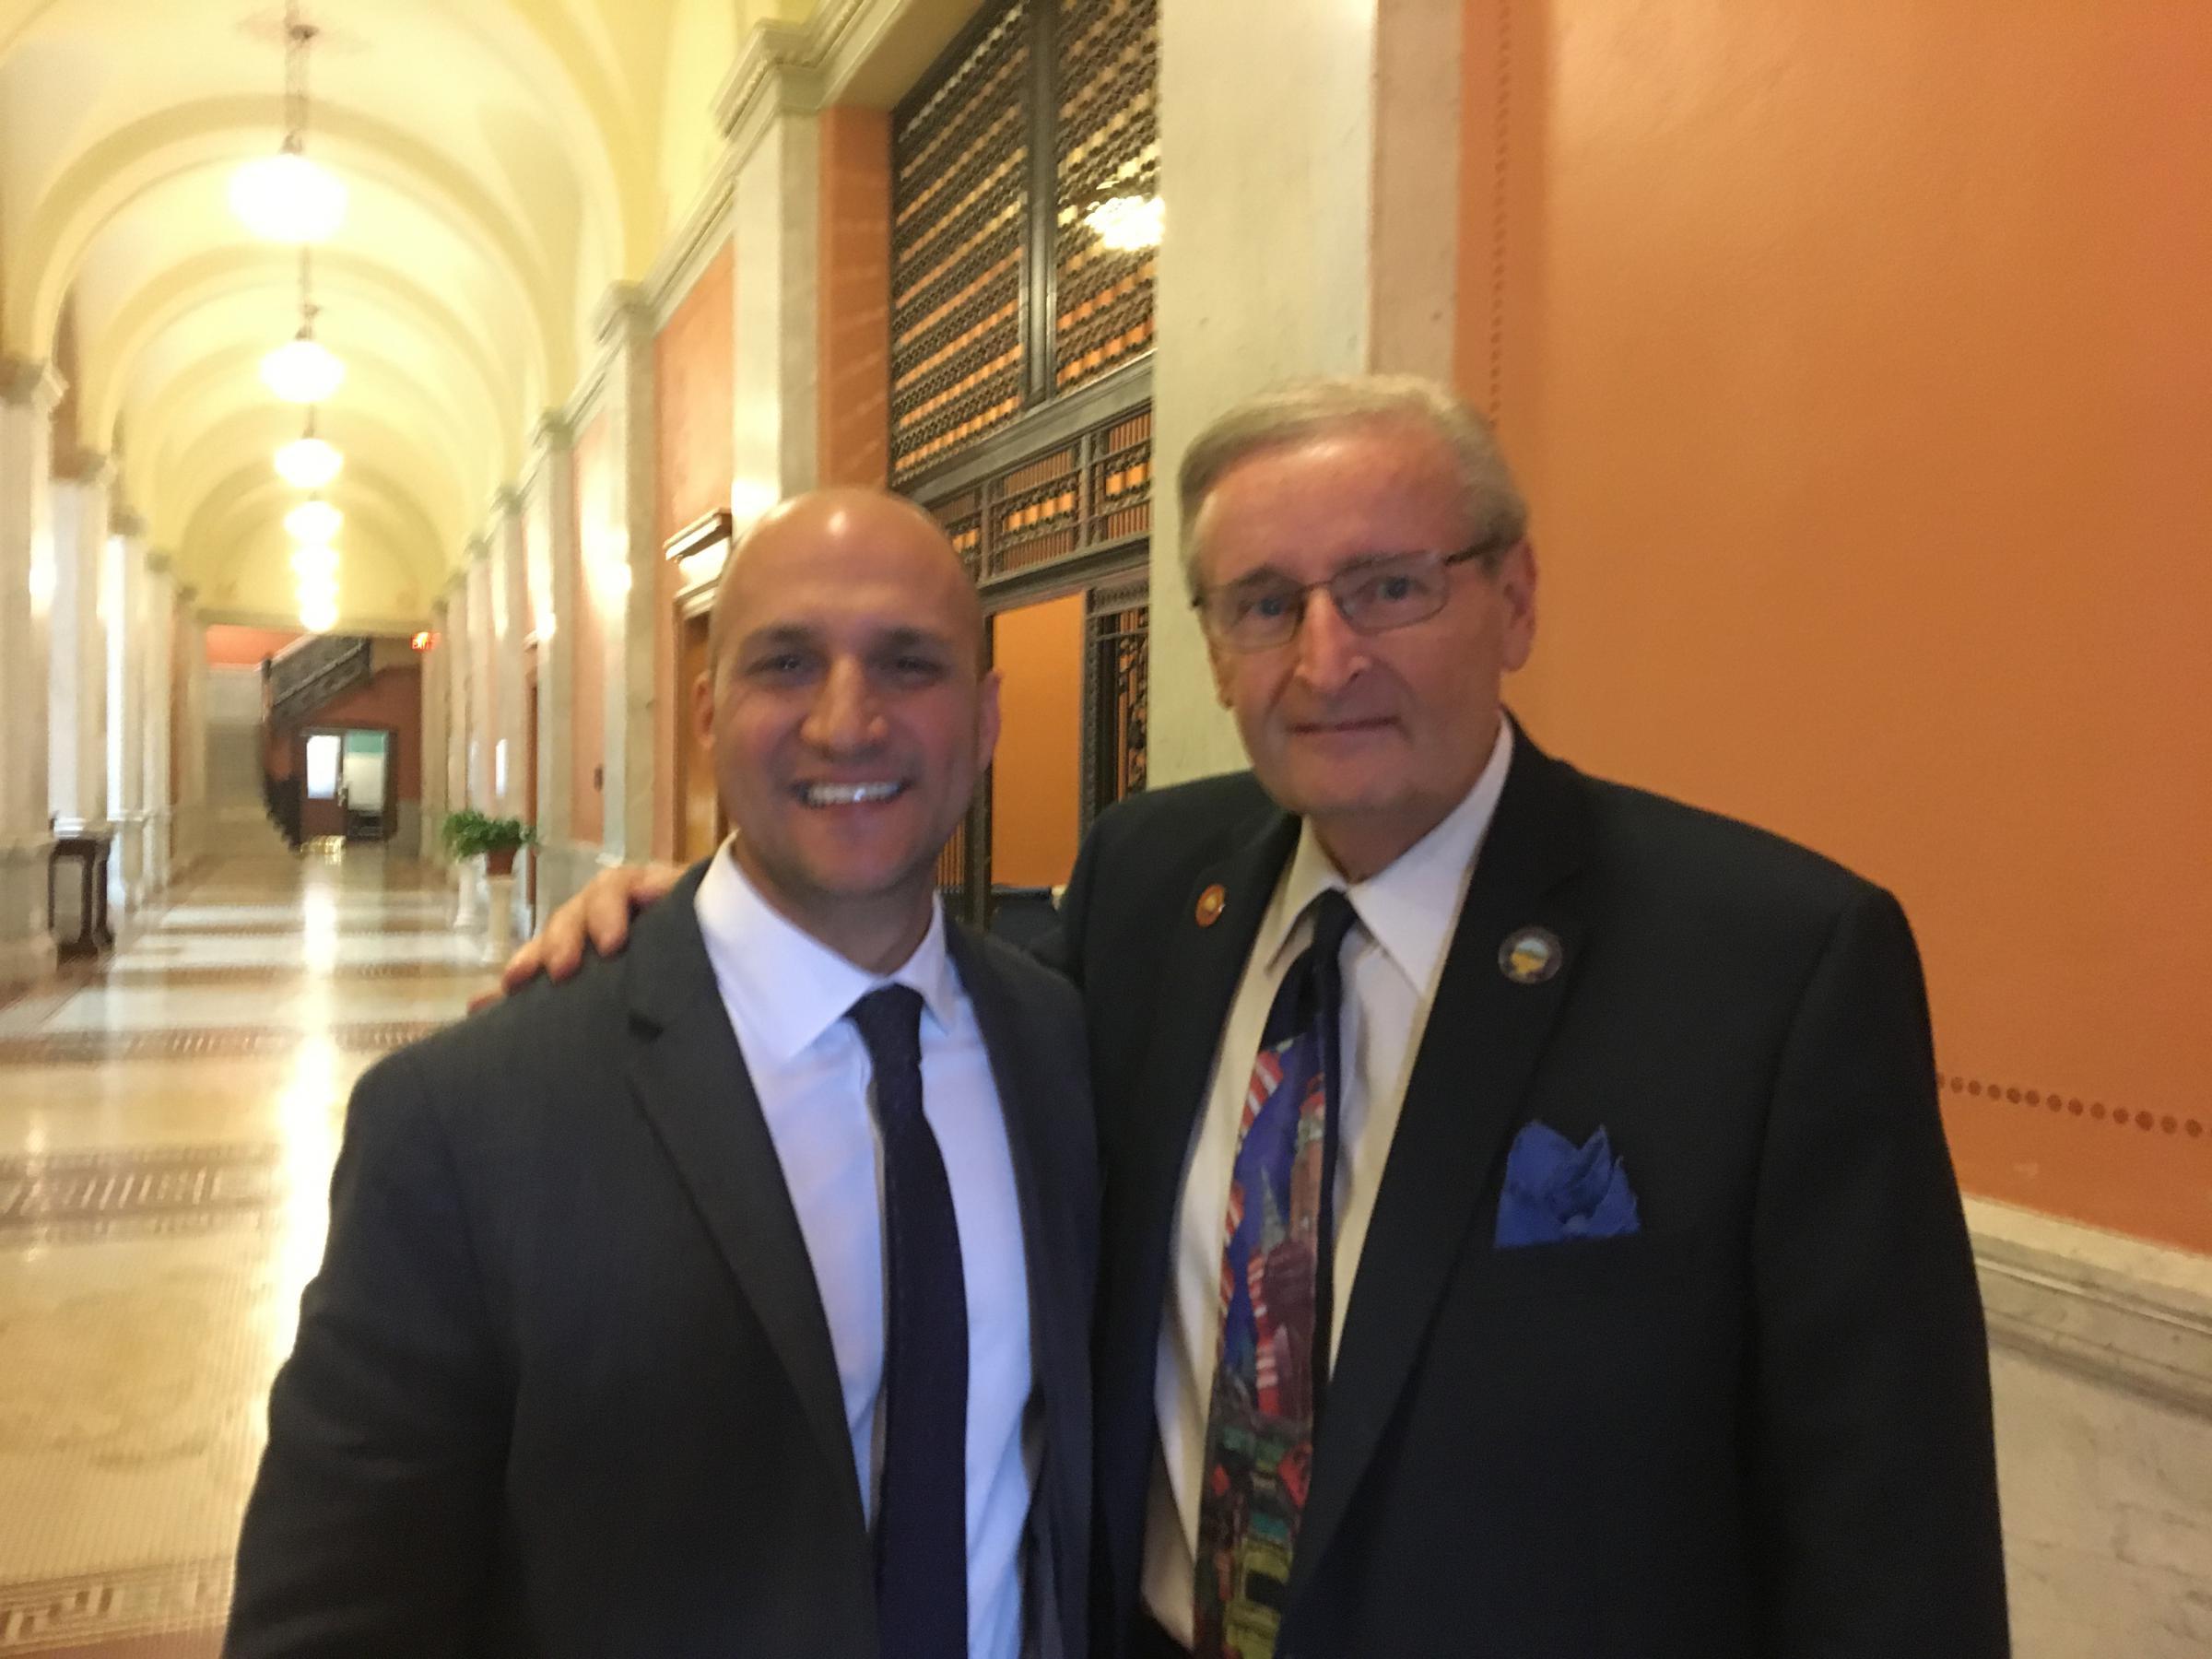 Joe Schiavoni steps down from Ohio Senate le... 2:23 pm Wed